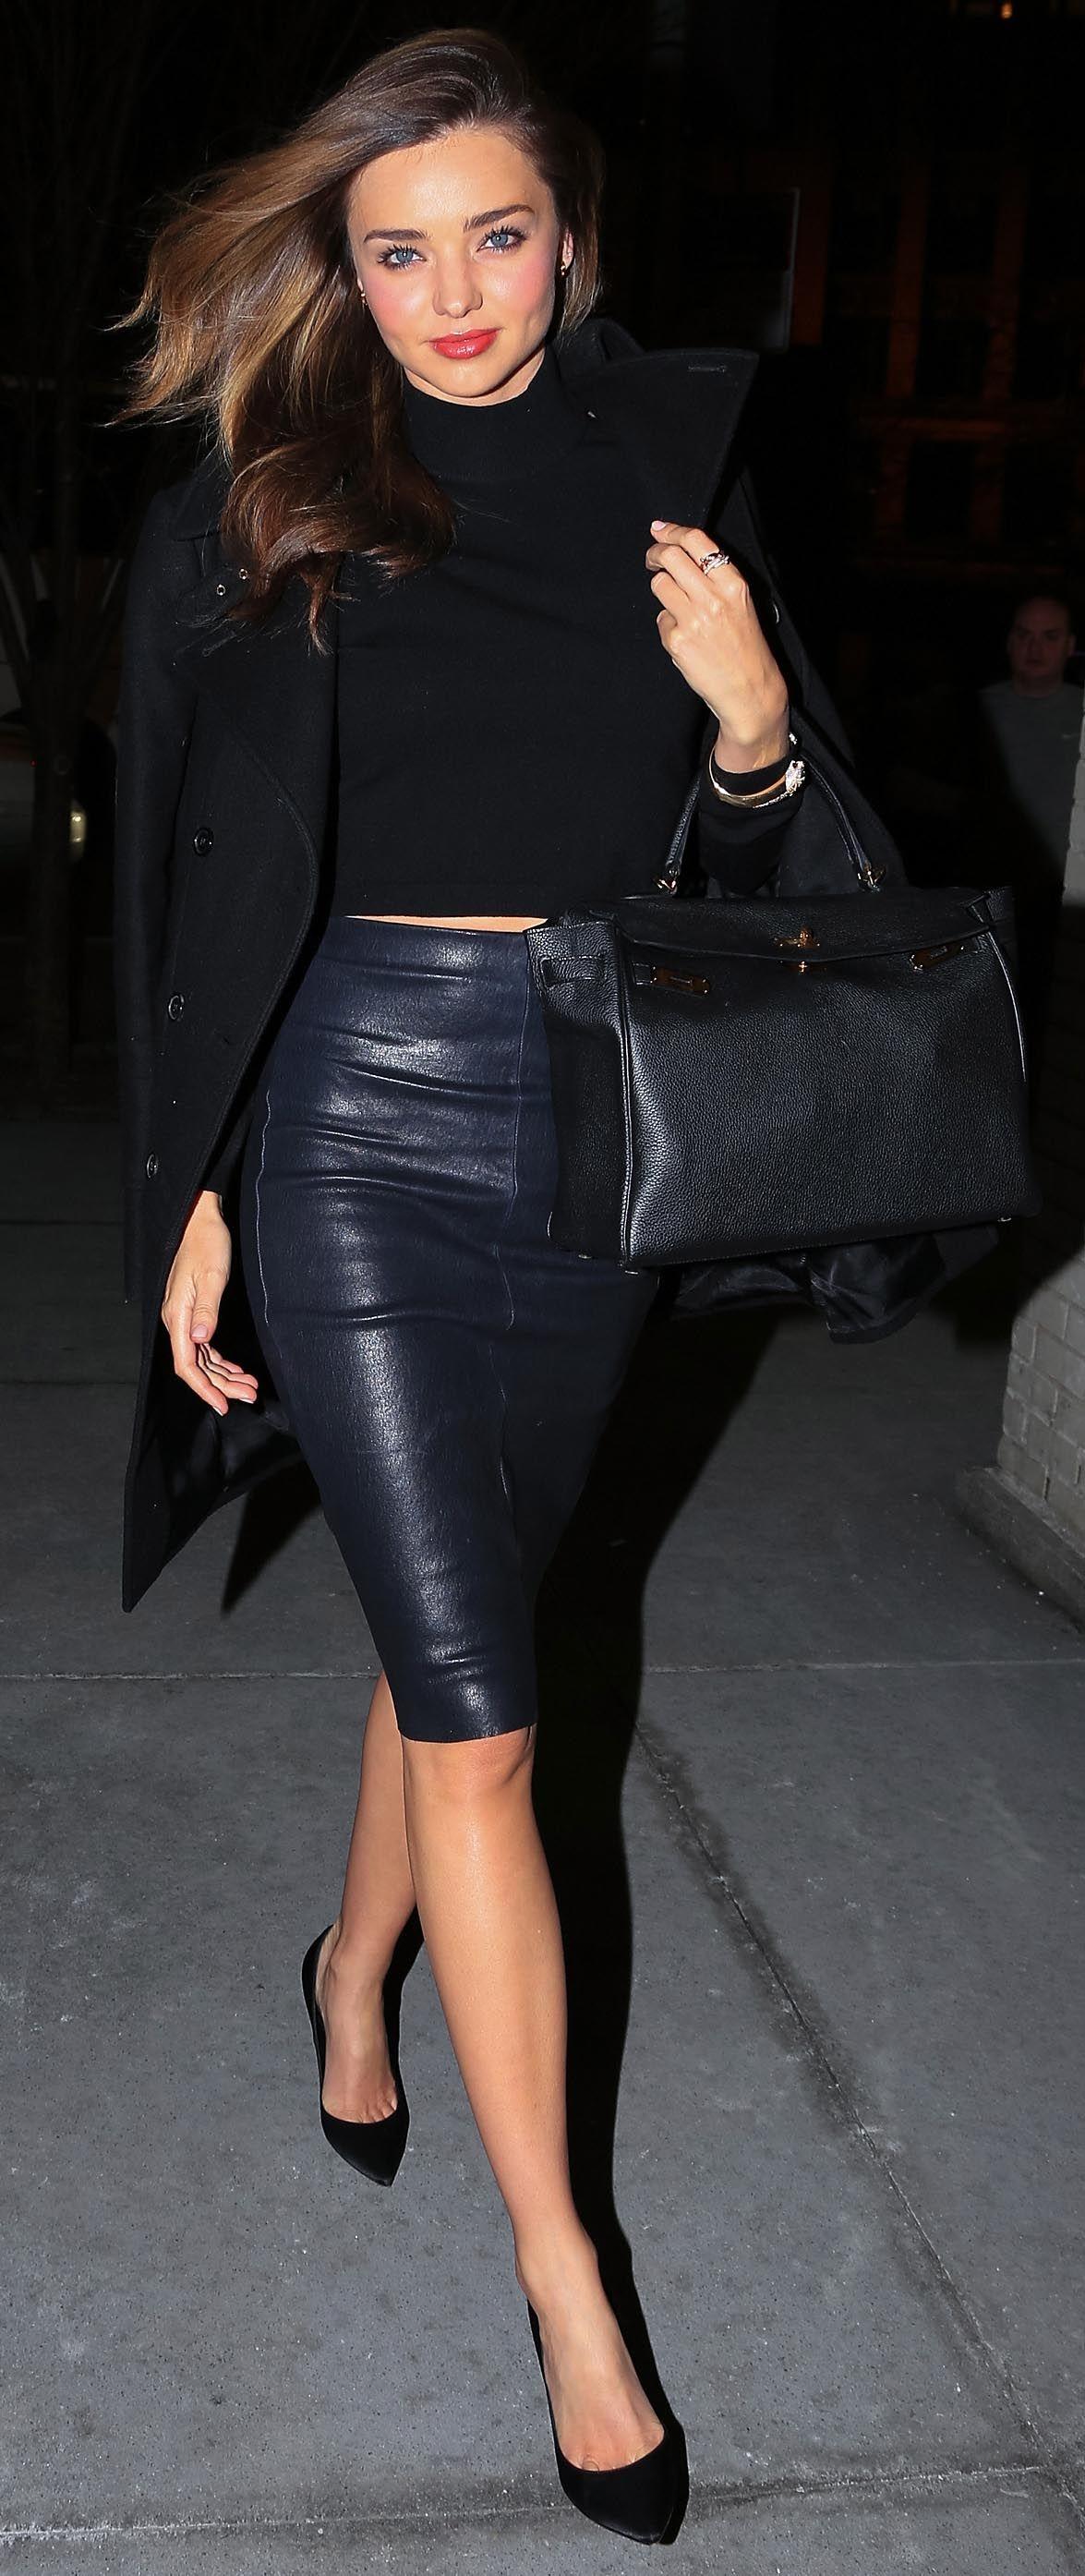 2e15ac4680 Miranda Kerr superb in all black and a leather pencil skirt <3 - IG:  @AurumForHer